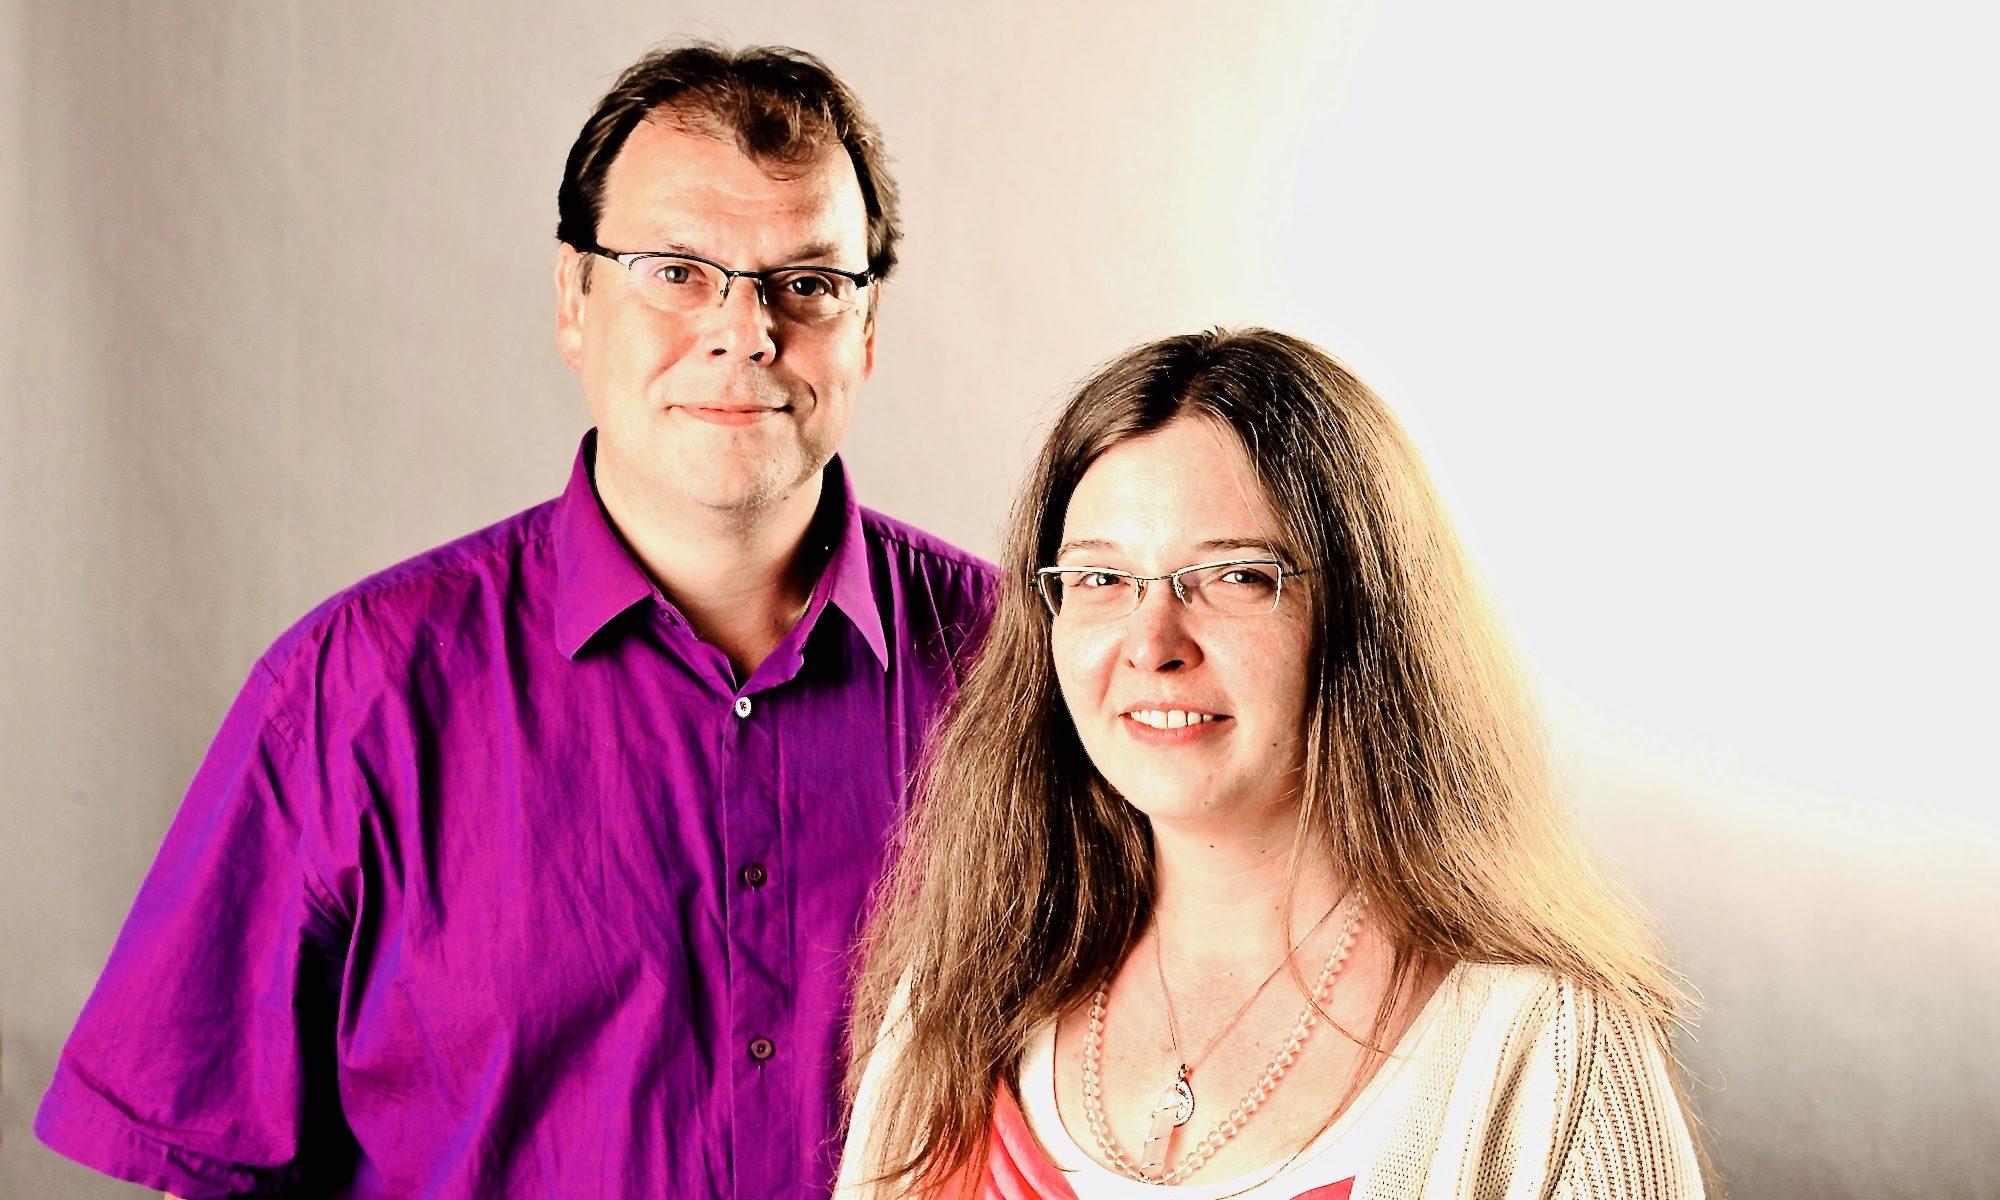 Wir - Mag. Verena Kautz und Andreas Wippel, © - Elisabeth Bolius